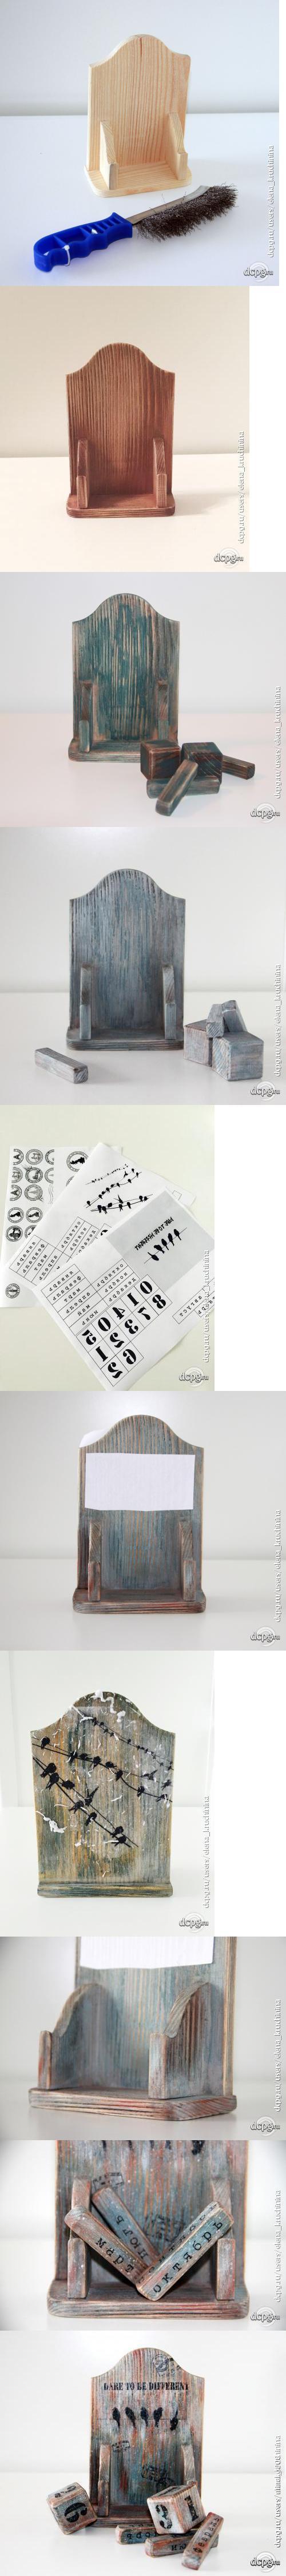 "Мастер-класс ""Календарь в стиле лофт"""